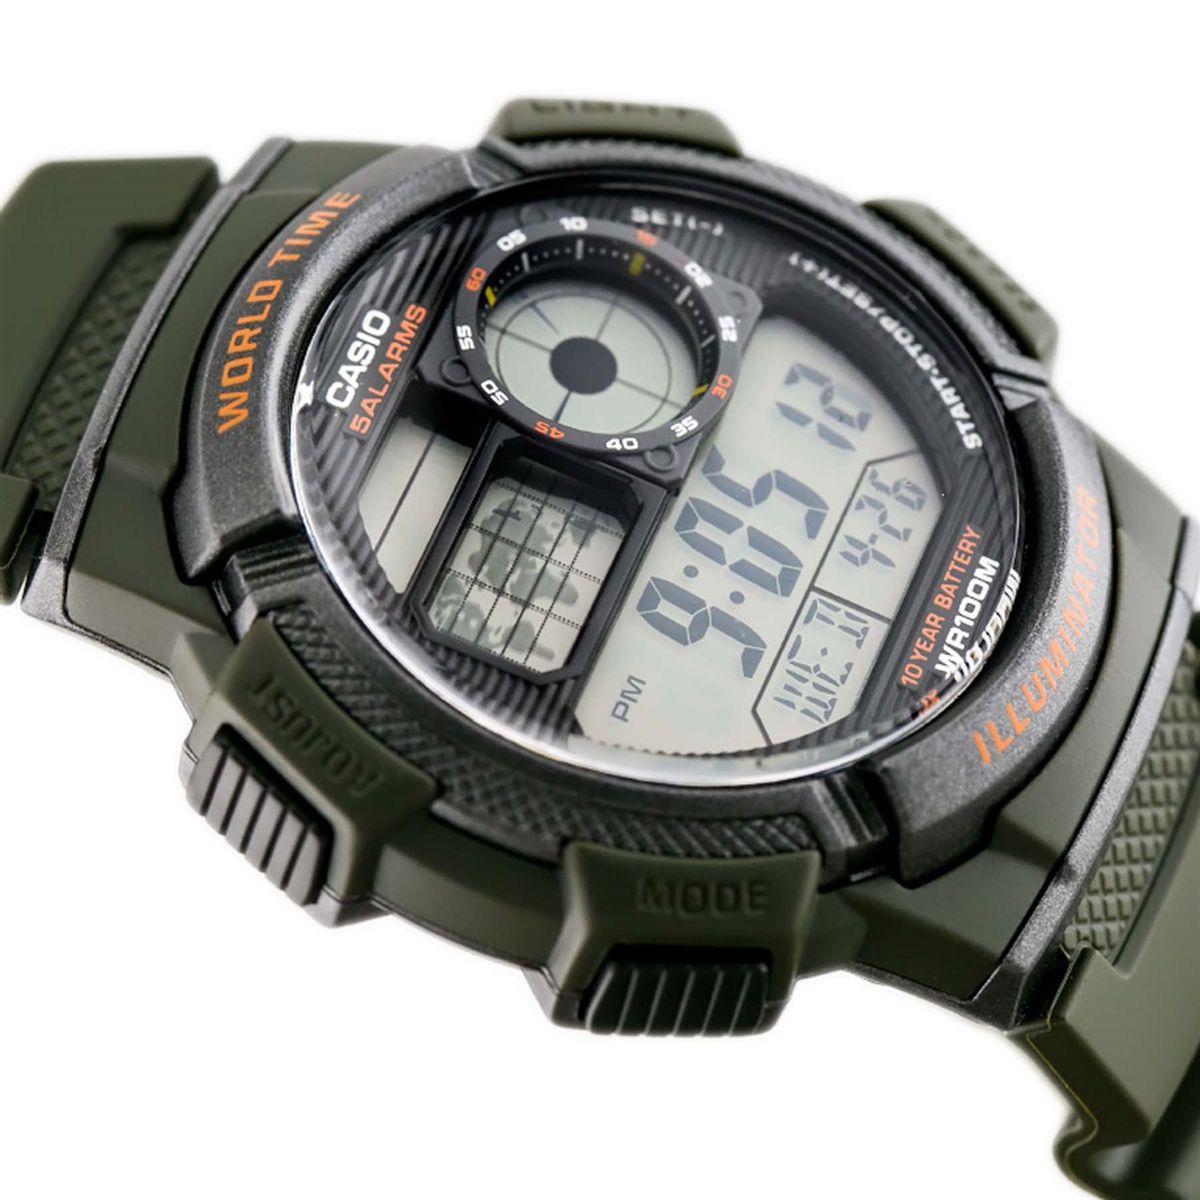 d124bcdea48 Relógio Casio Digital Masculino AE-1000W-3AVD - Relógio Masculino ...